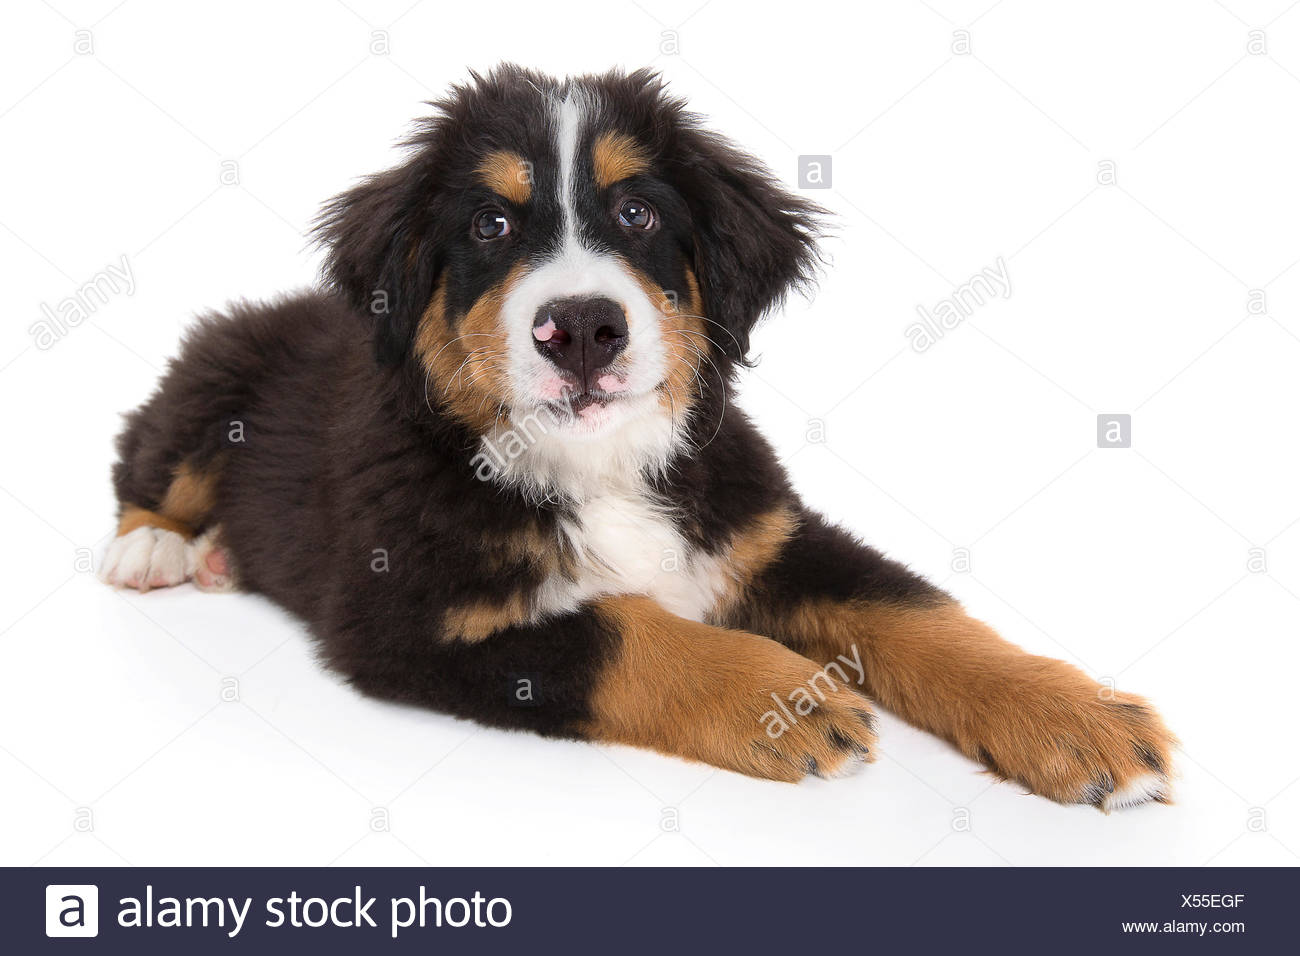 bernese mountain dog puppy 16 weeks lying X55EGF